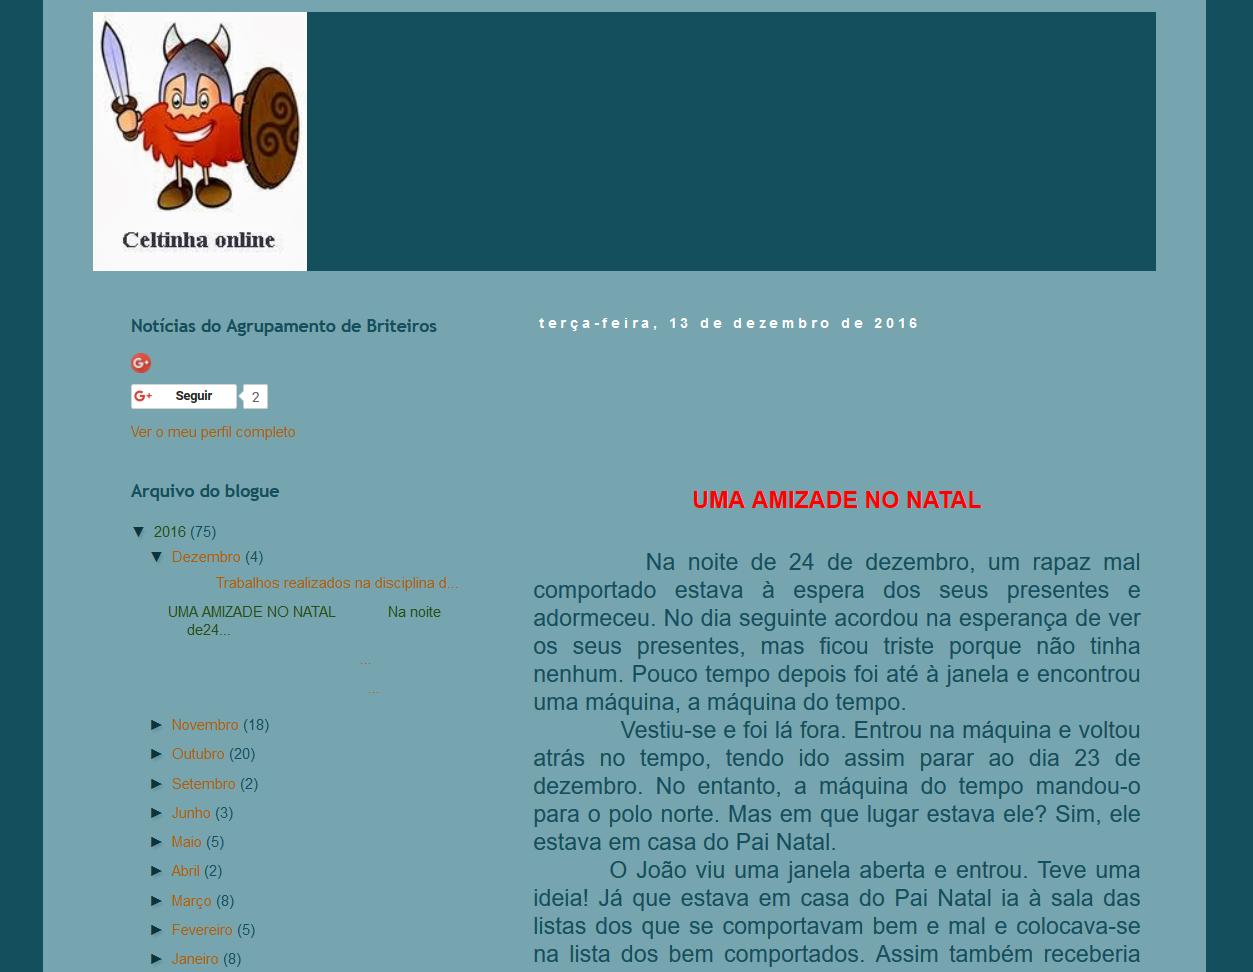 Celtinha Online